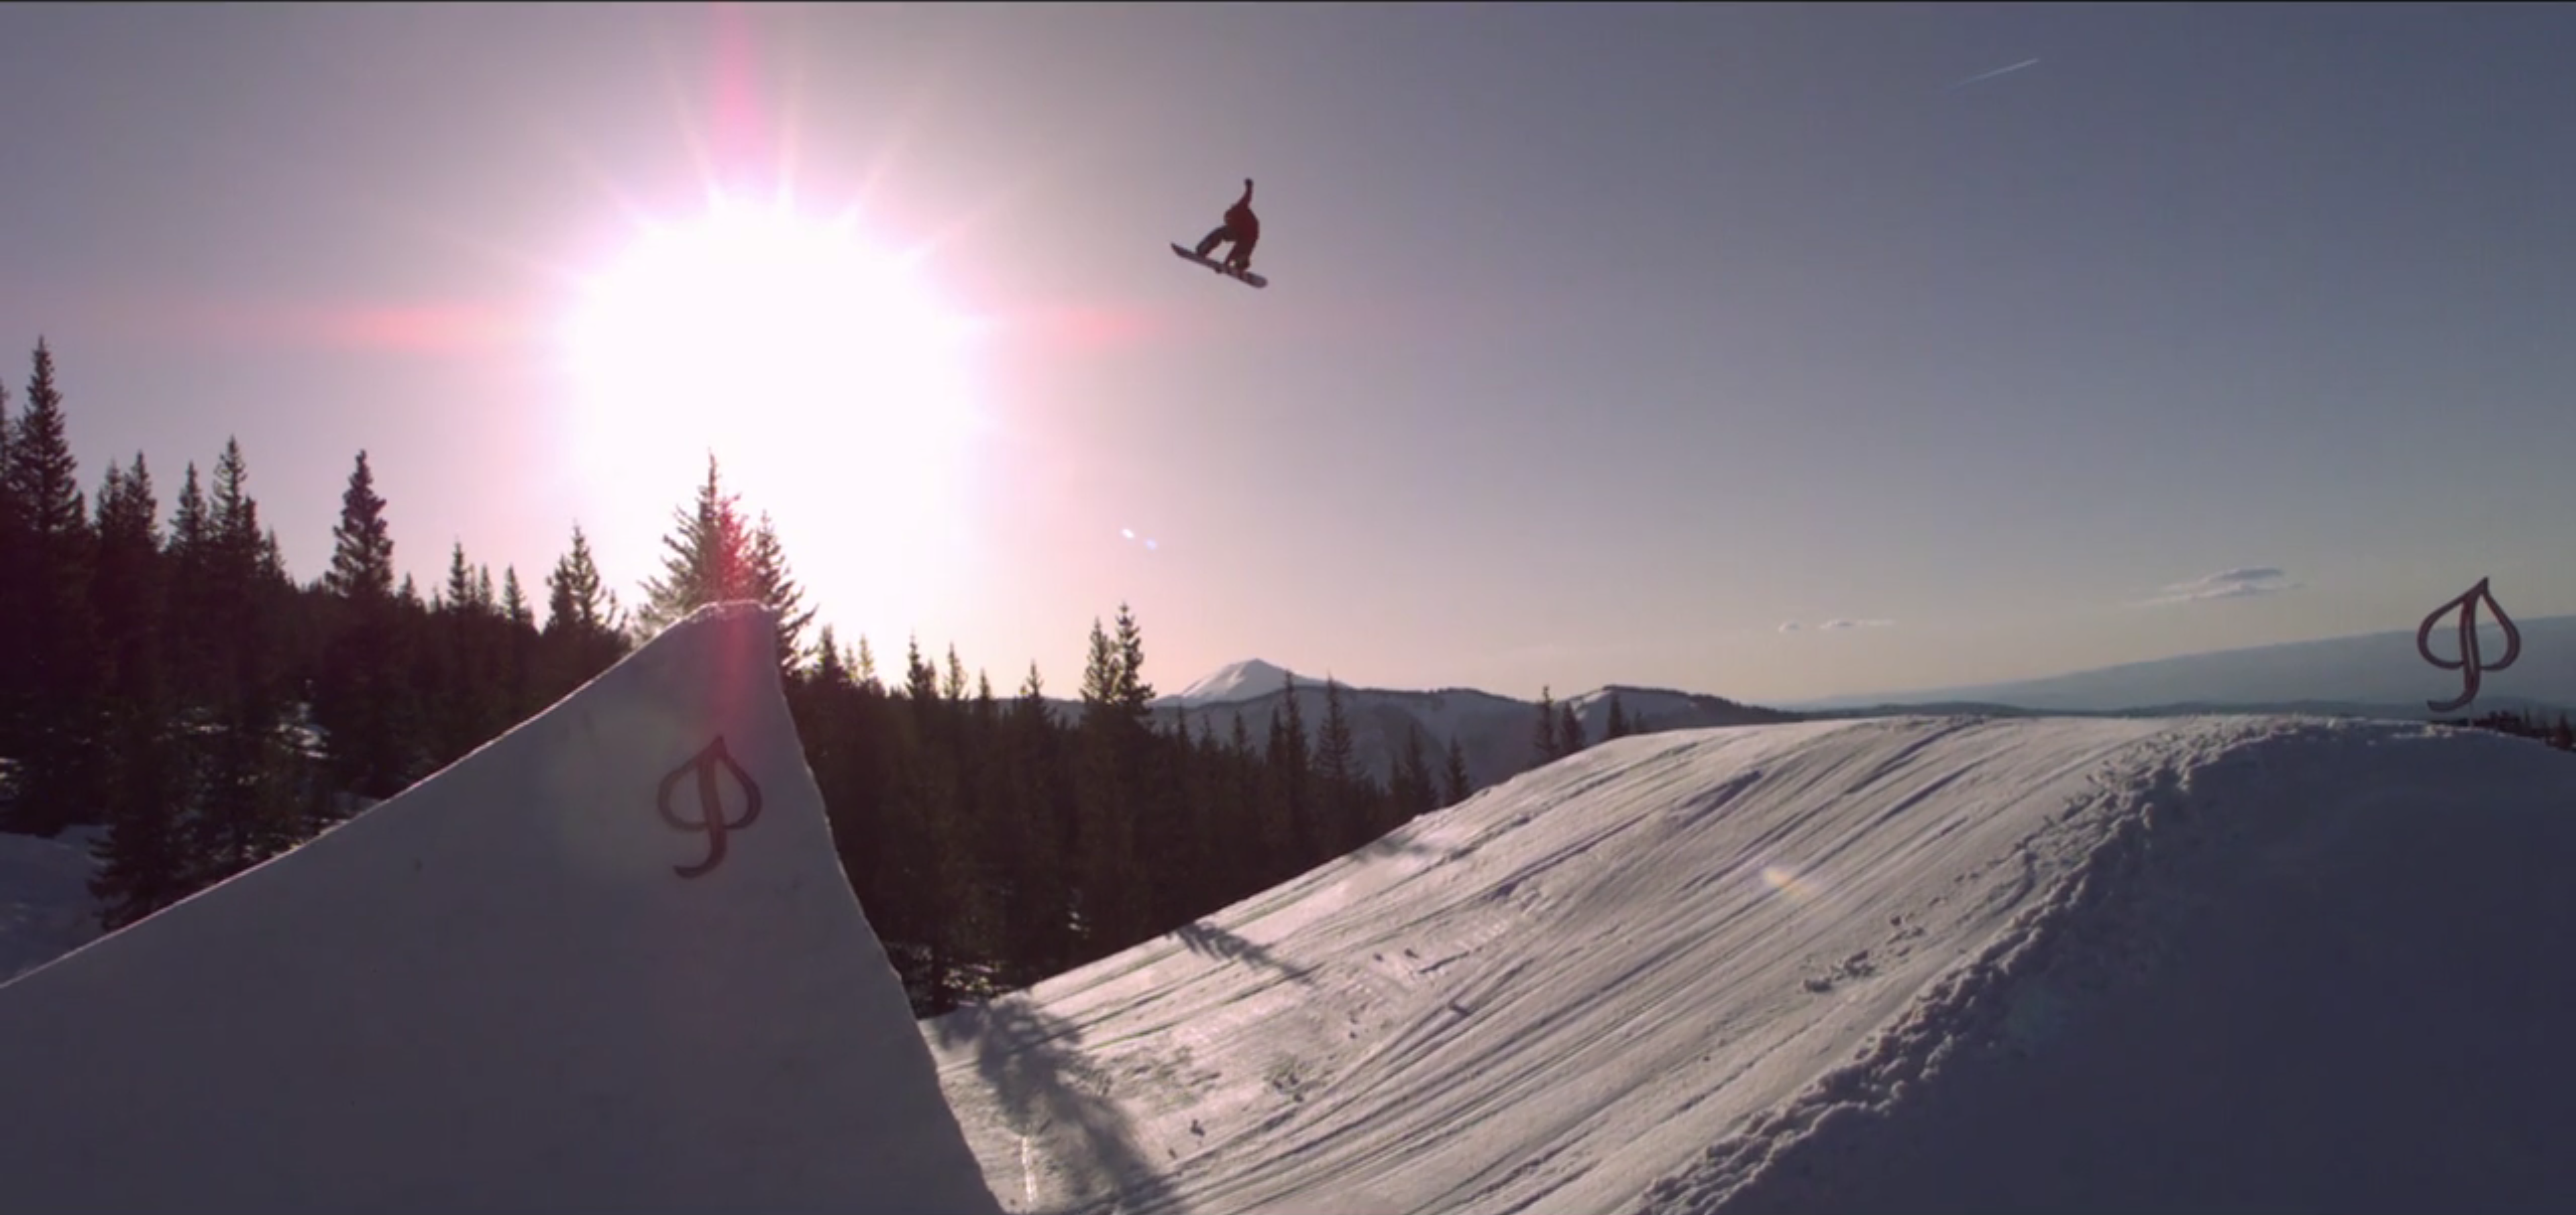 drone filming a snowboard jump